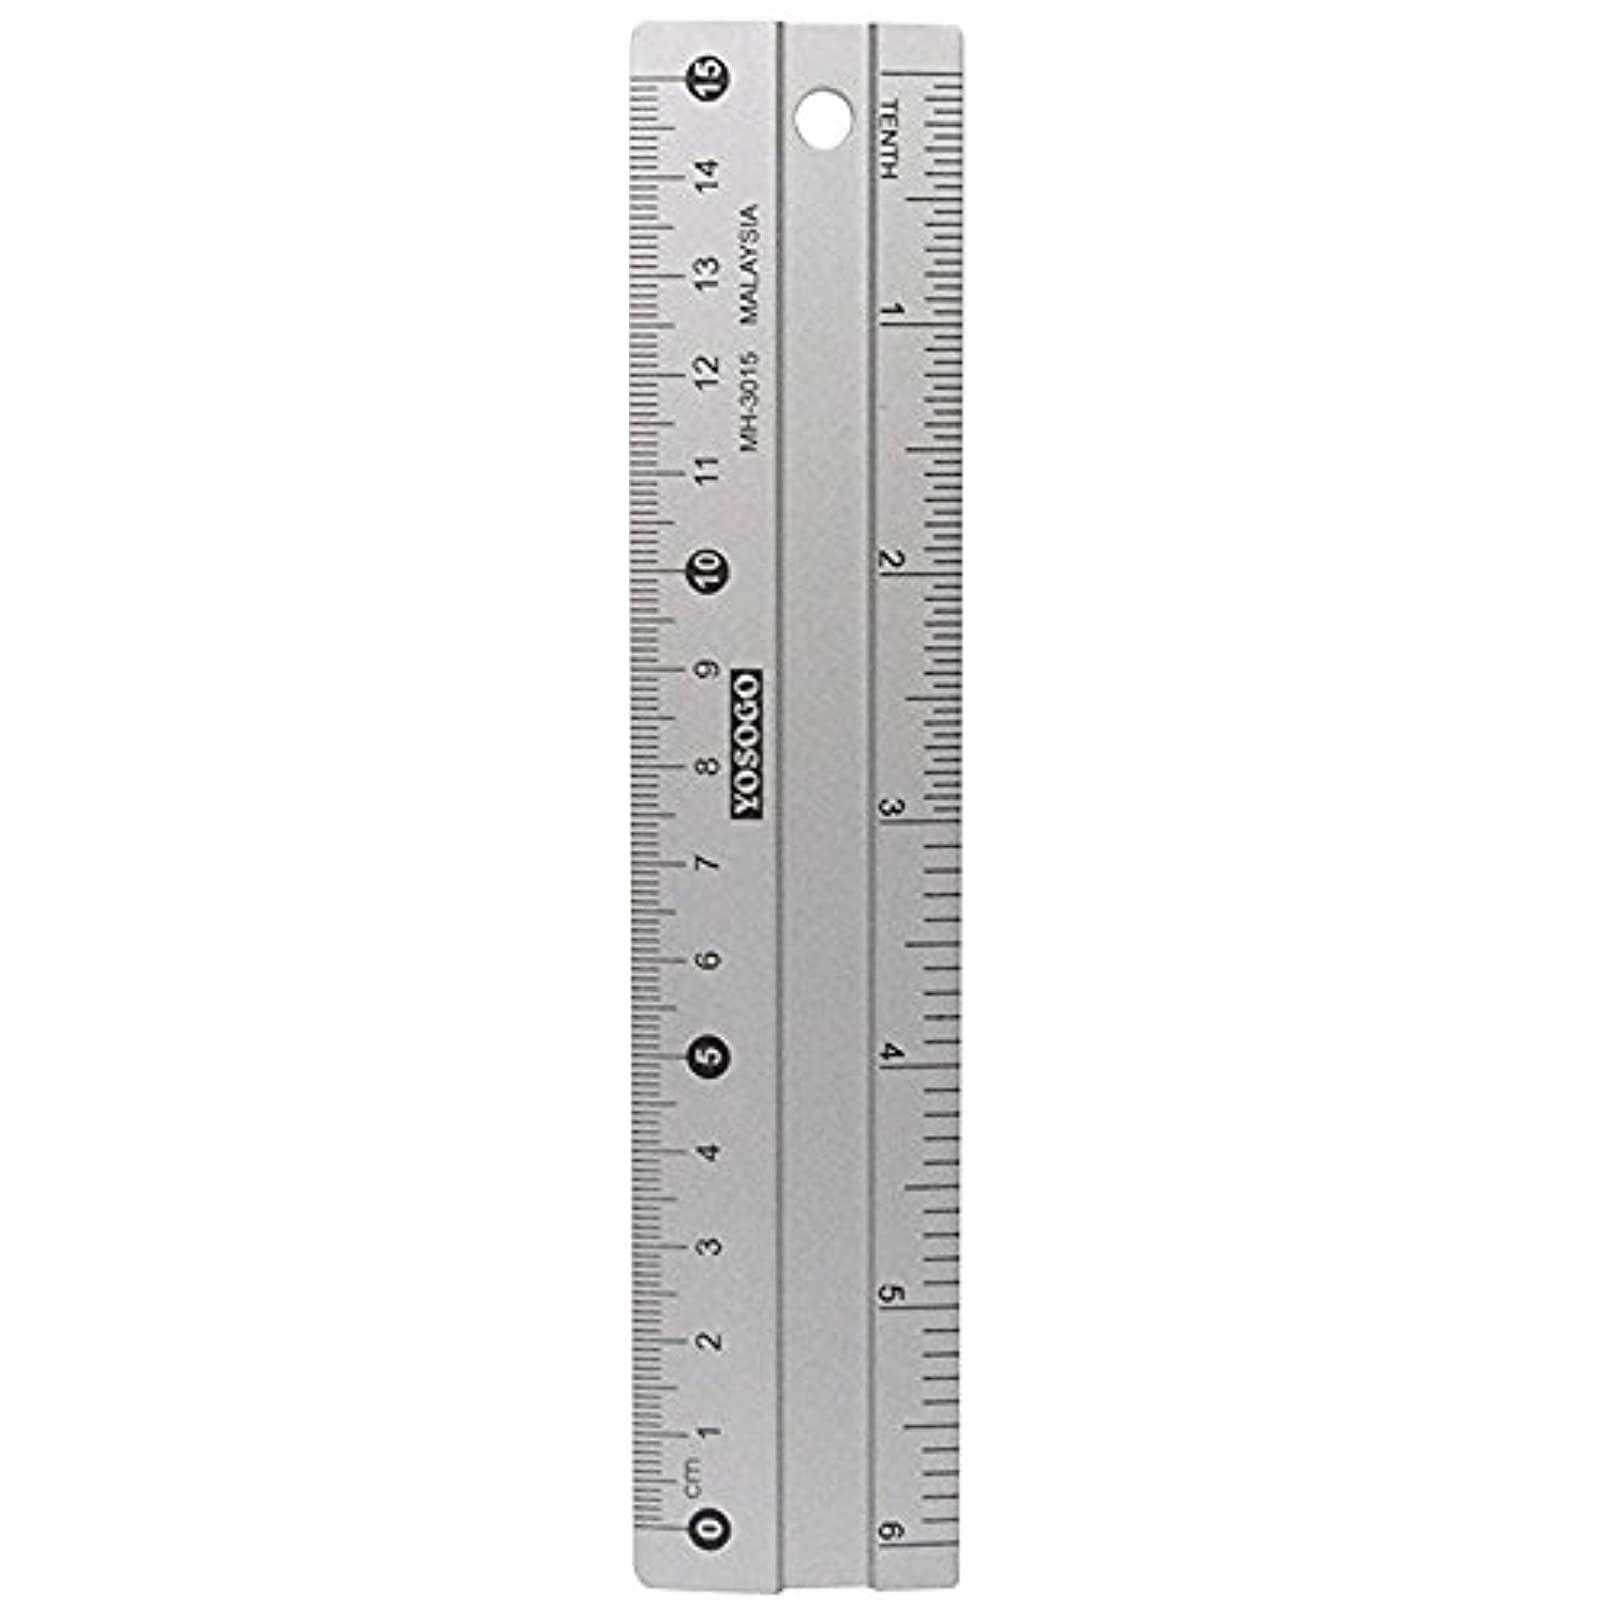 20 inch / 20 cm Anti Slip Aluminum Ruler  Pack of 20